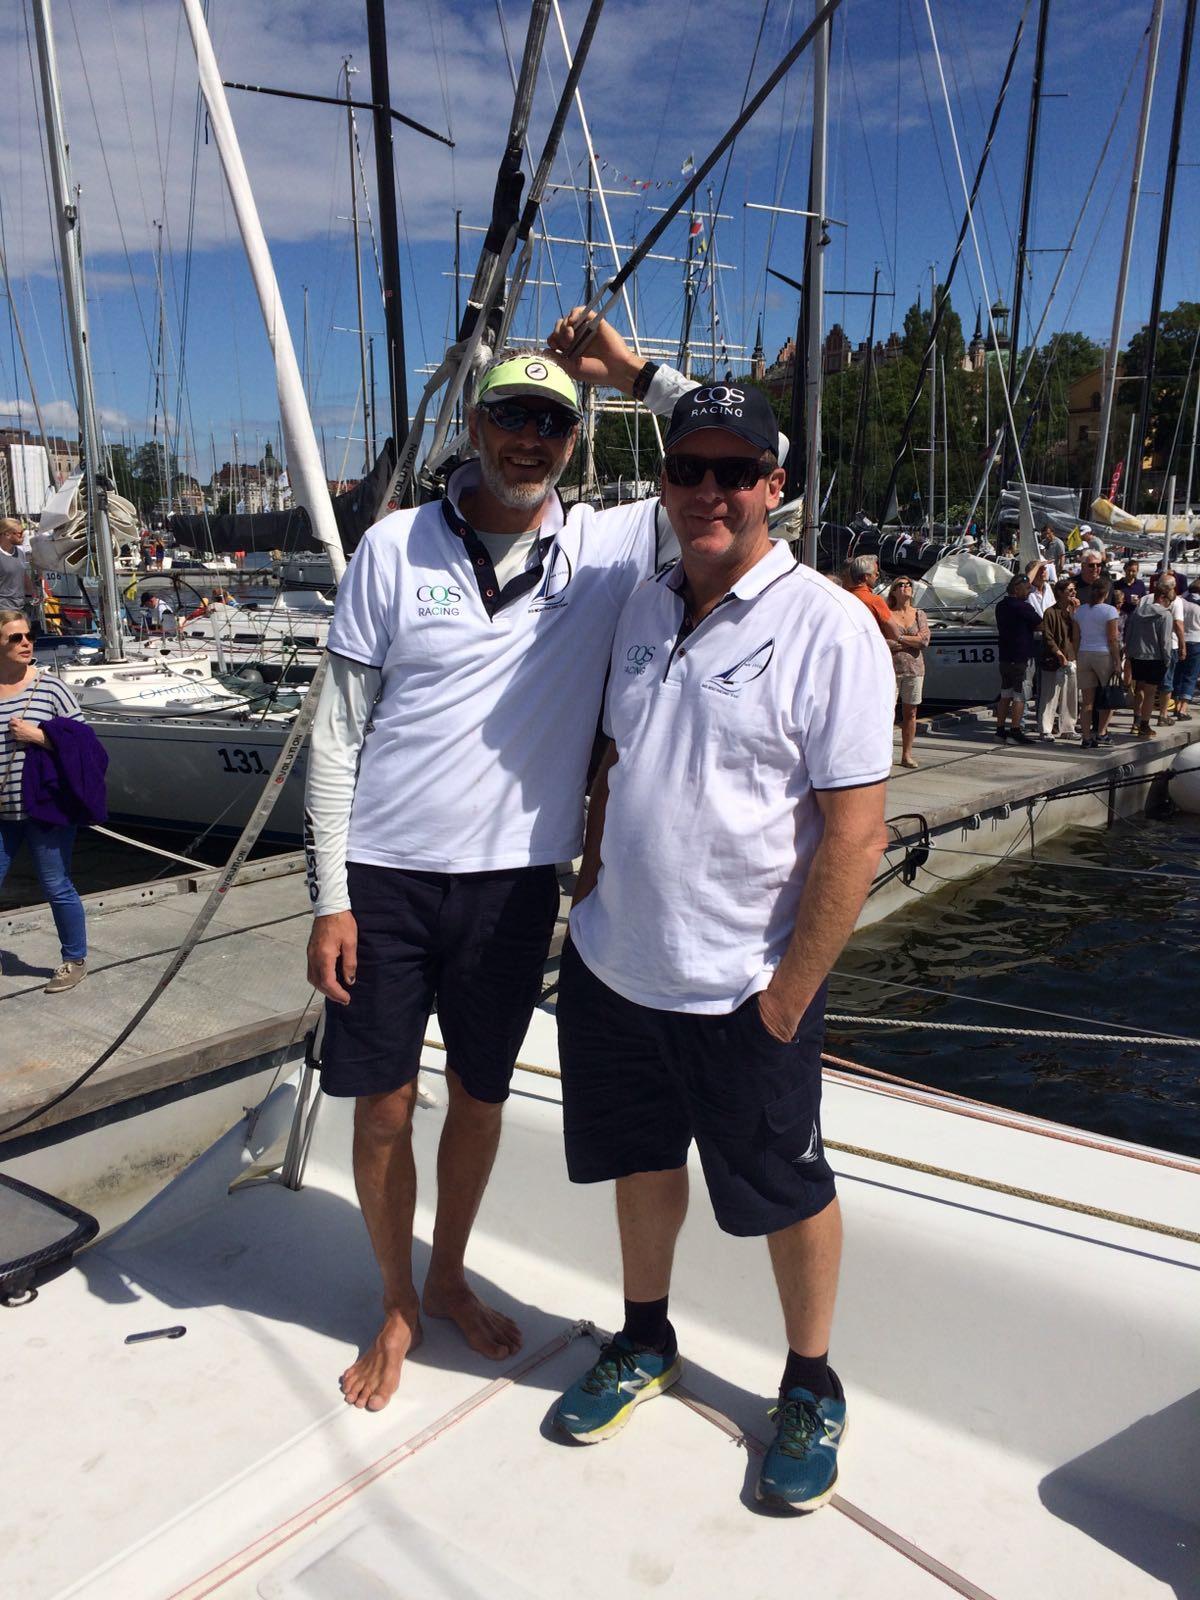 Crew Members Per Jonsson and Greg Prescott, former winners of the Gotland race, killing time ahead of the 2017 Gotland Runt.